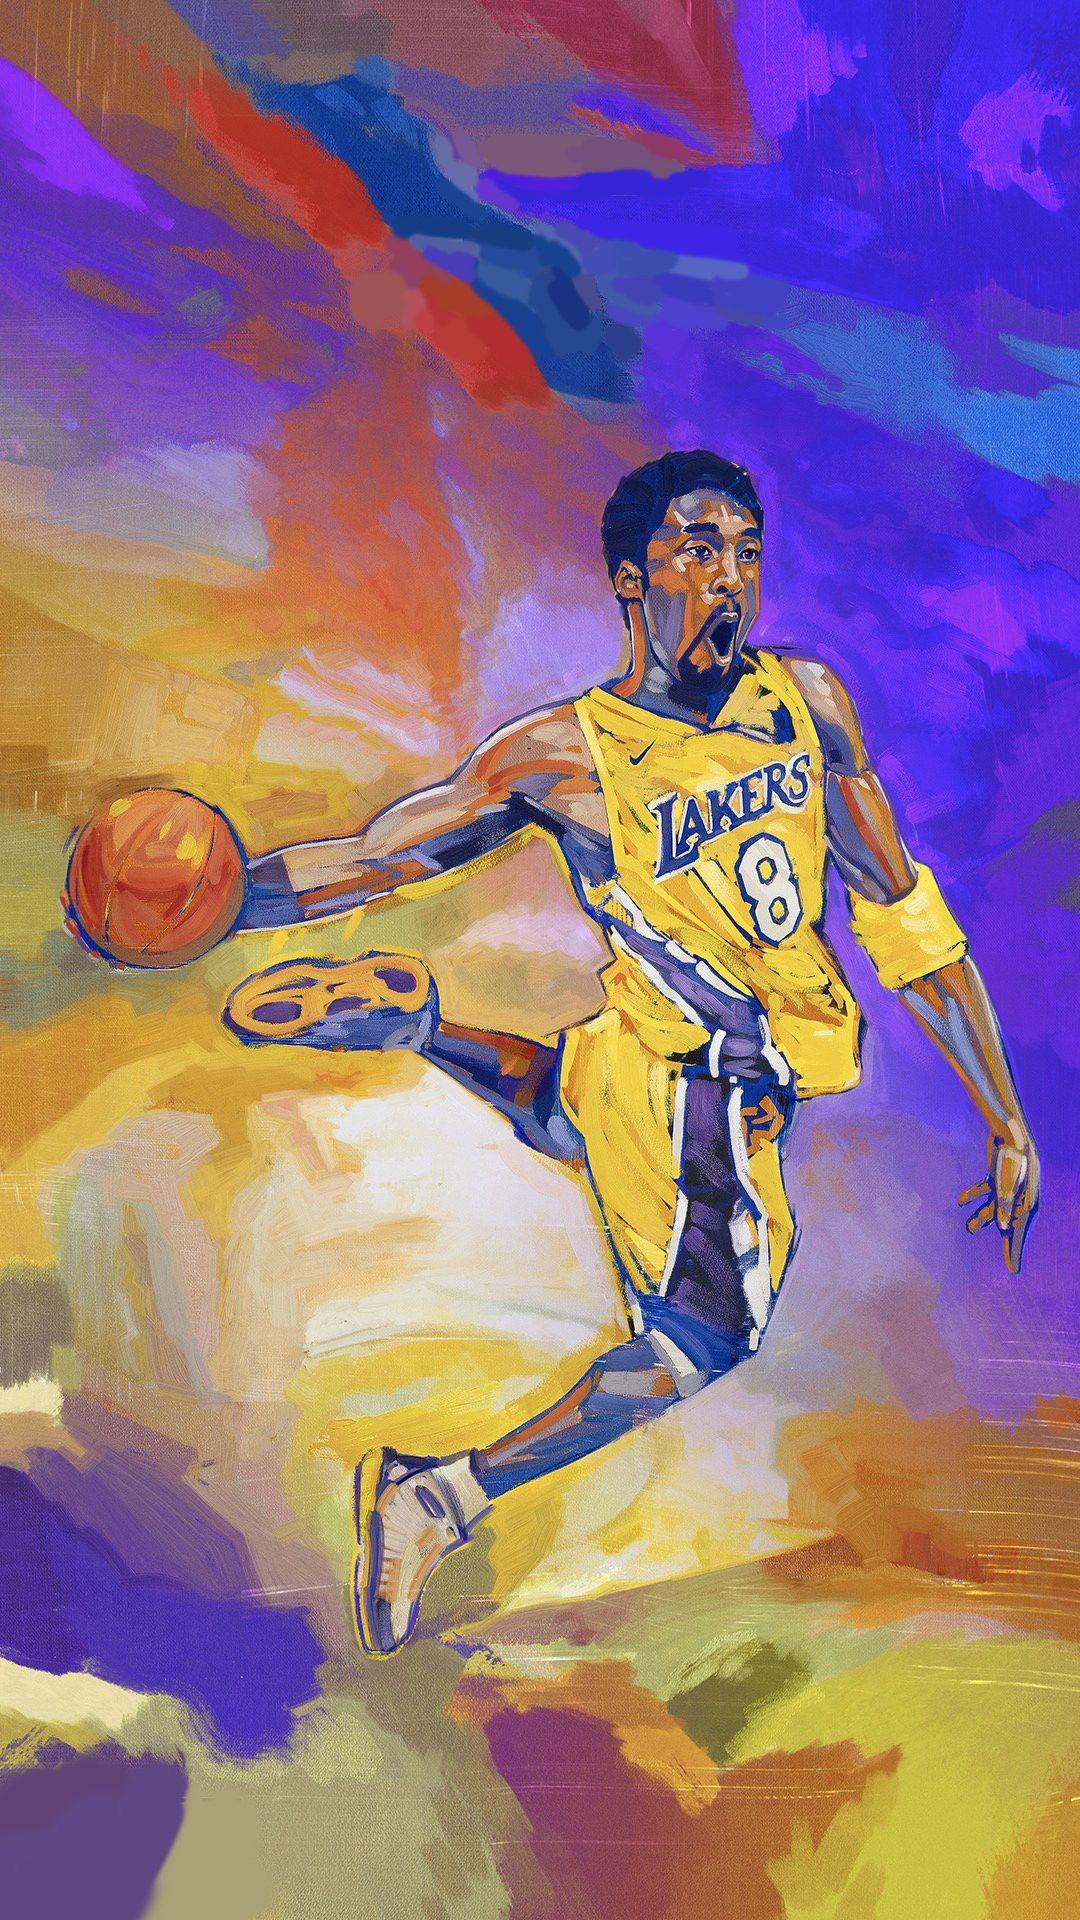 Kobe Bryant Wallpaper In 2020 Kobe Bryant Wallpaper Kobe Bryant Poster Kobe Bryant